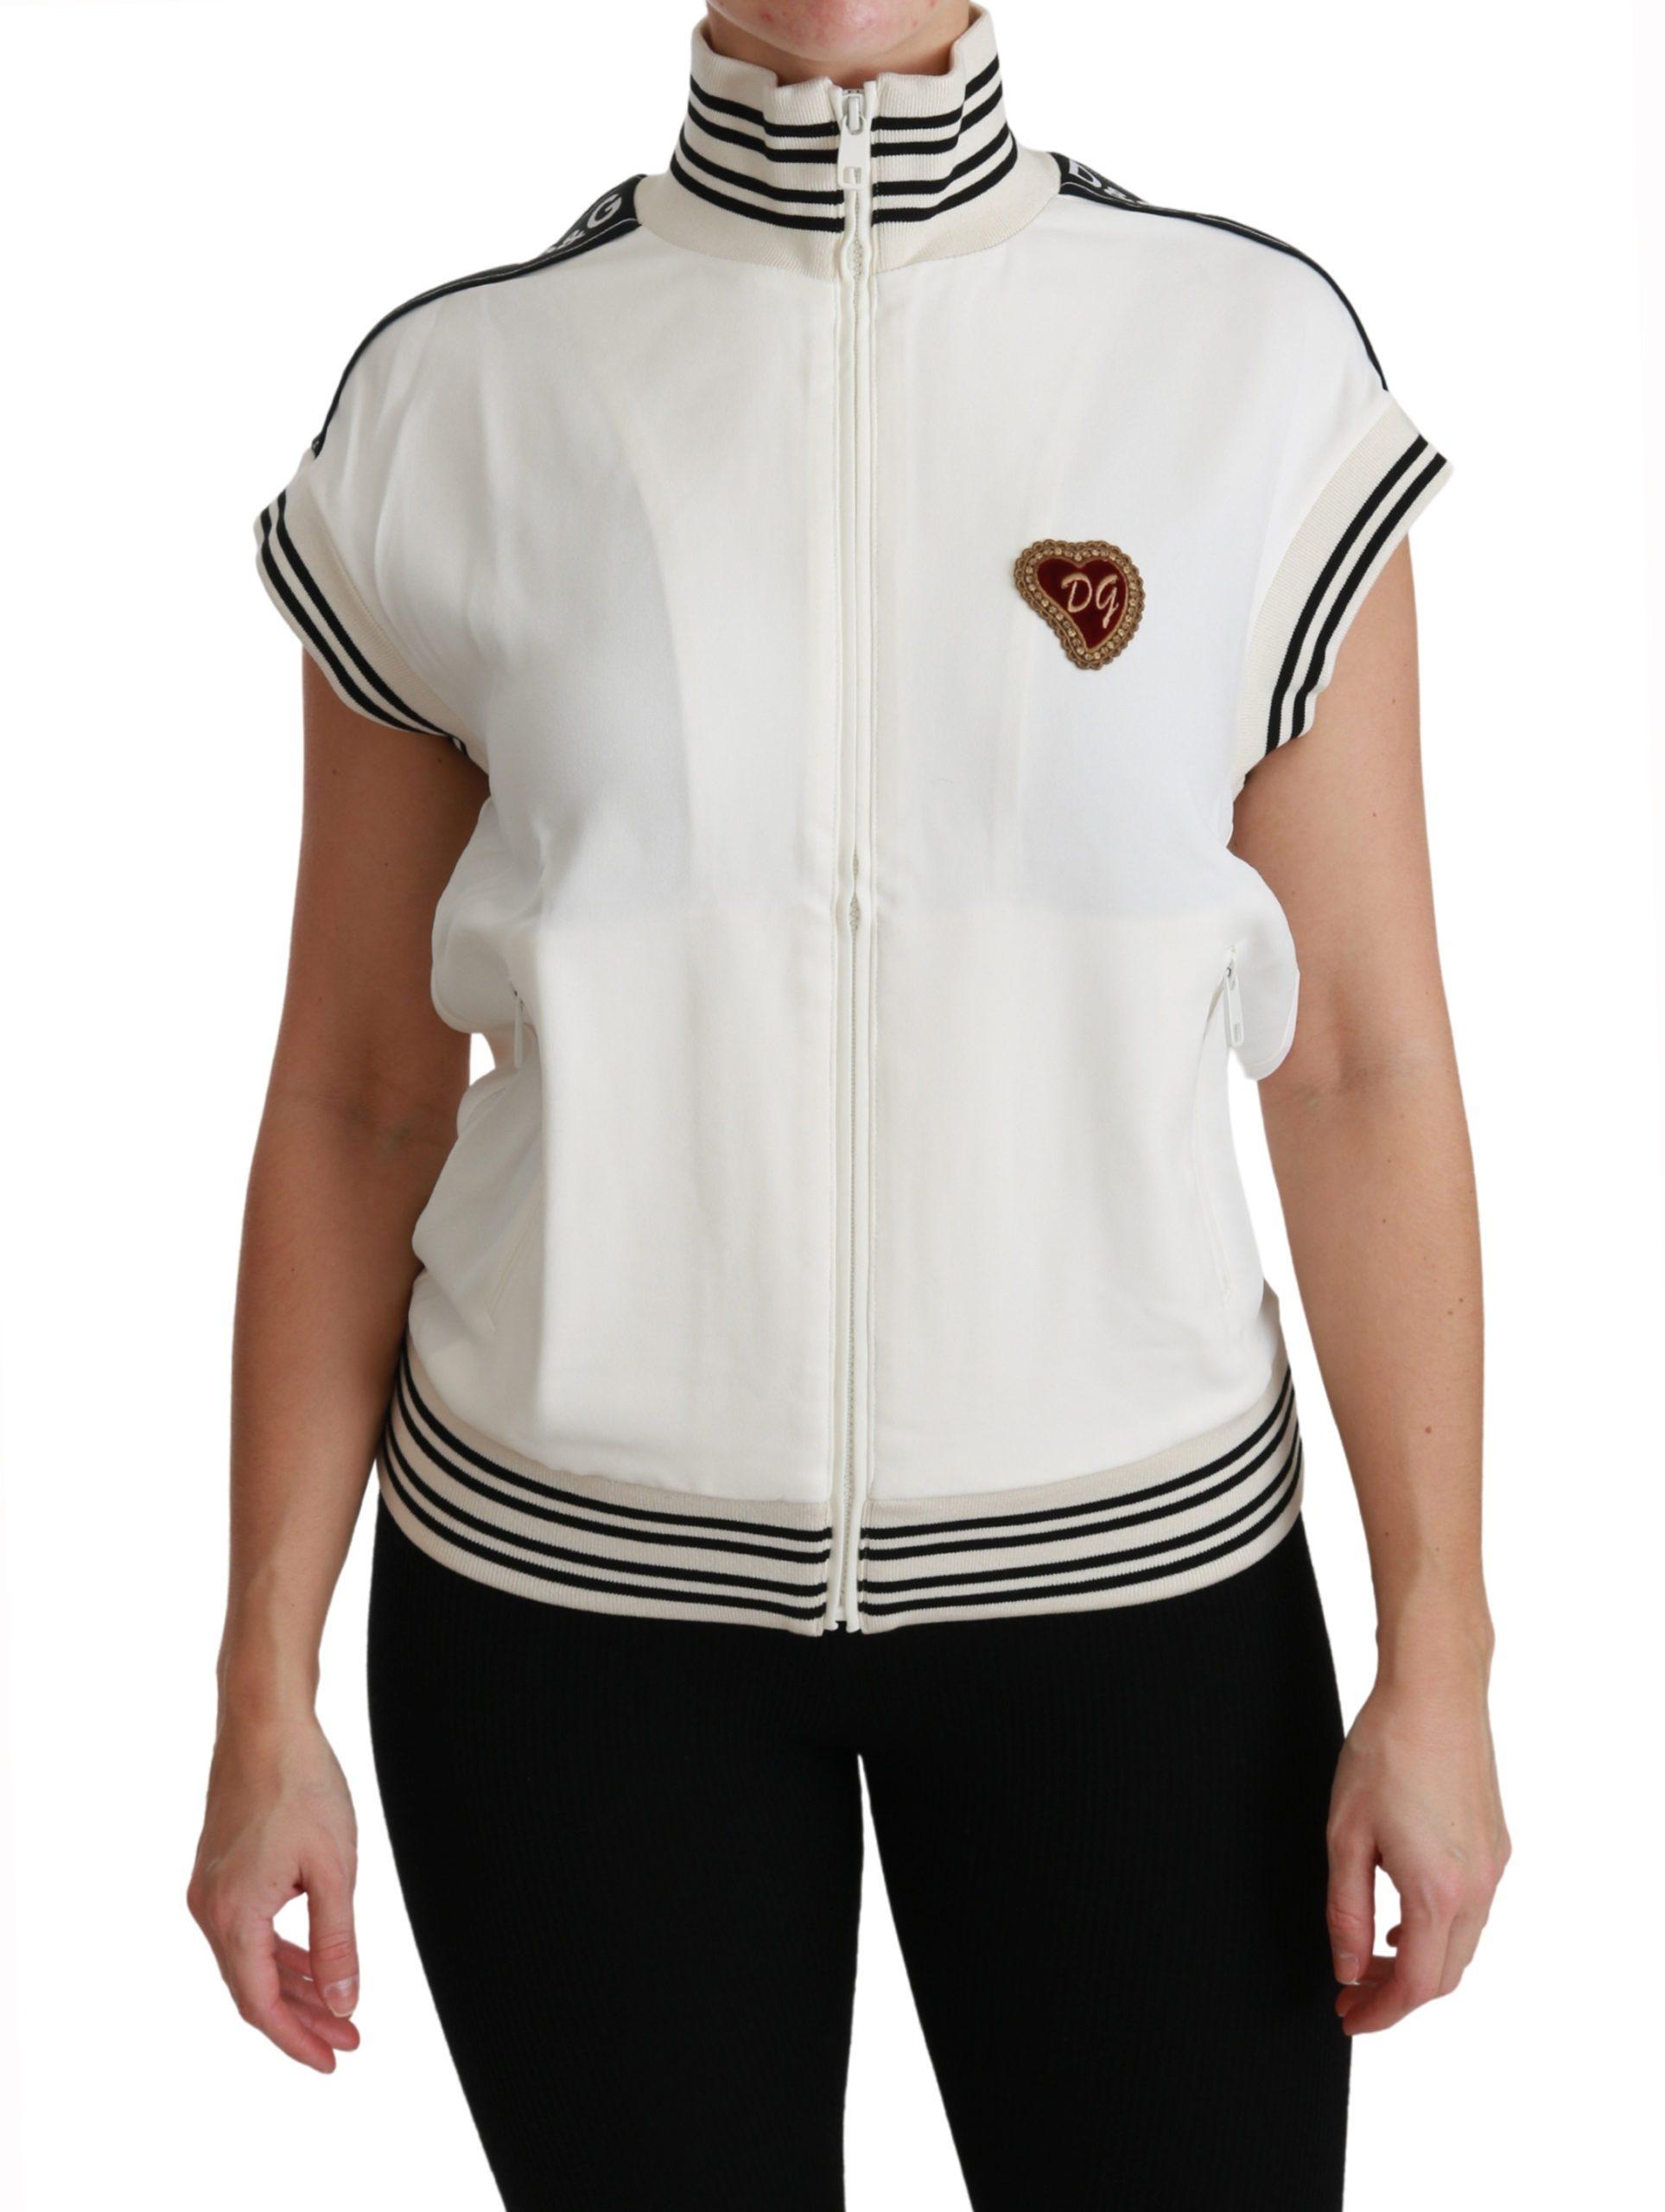 Dolce & Gabbana Women's Sacro Cuore Heart Zipper Sweater Black TSH4510 - IT36   XS